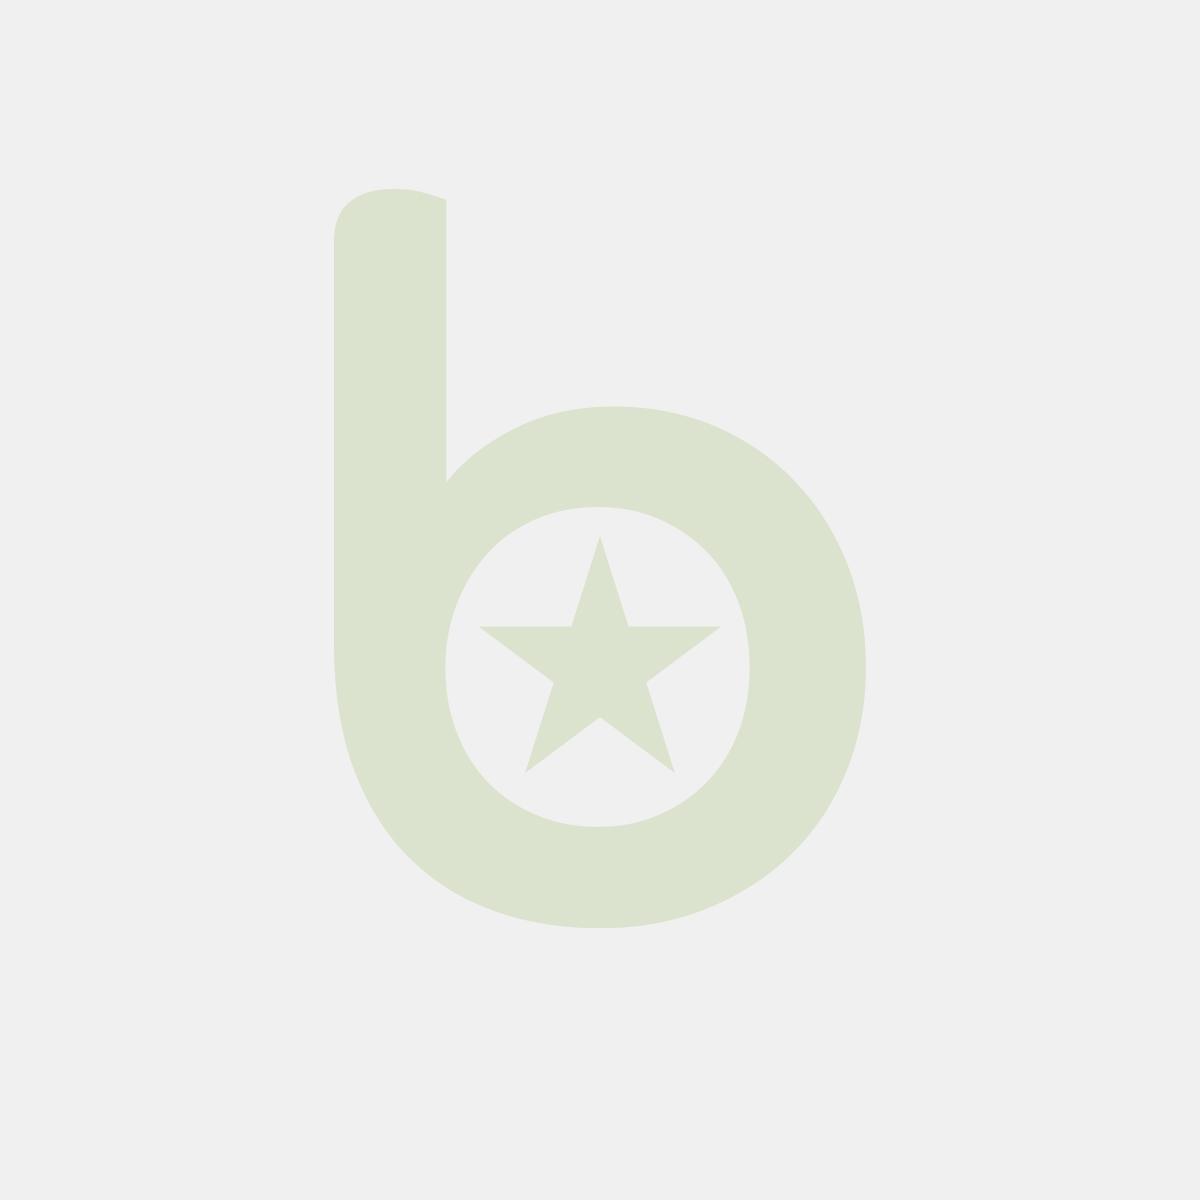 FINGERFOOD - tacka MINI biała SABERT 6x19cm MOZAIK op. 20 sztuk